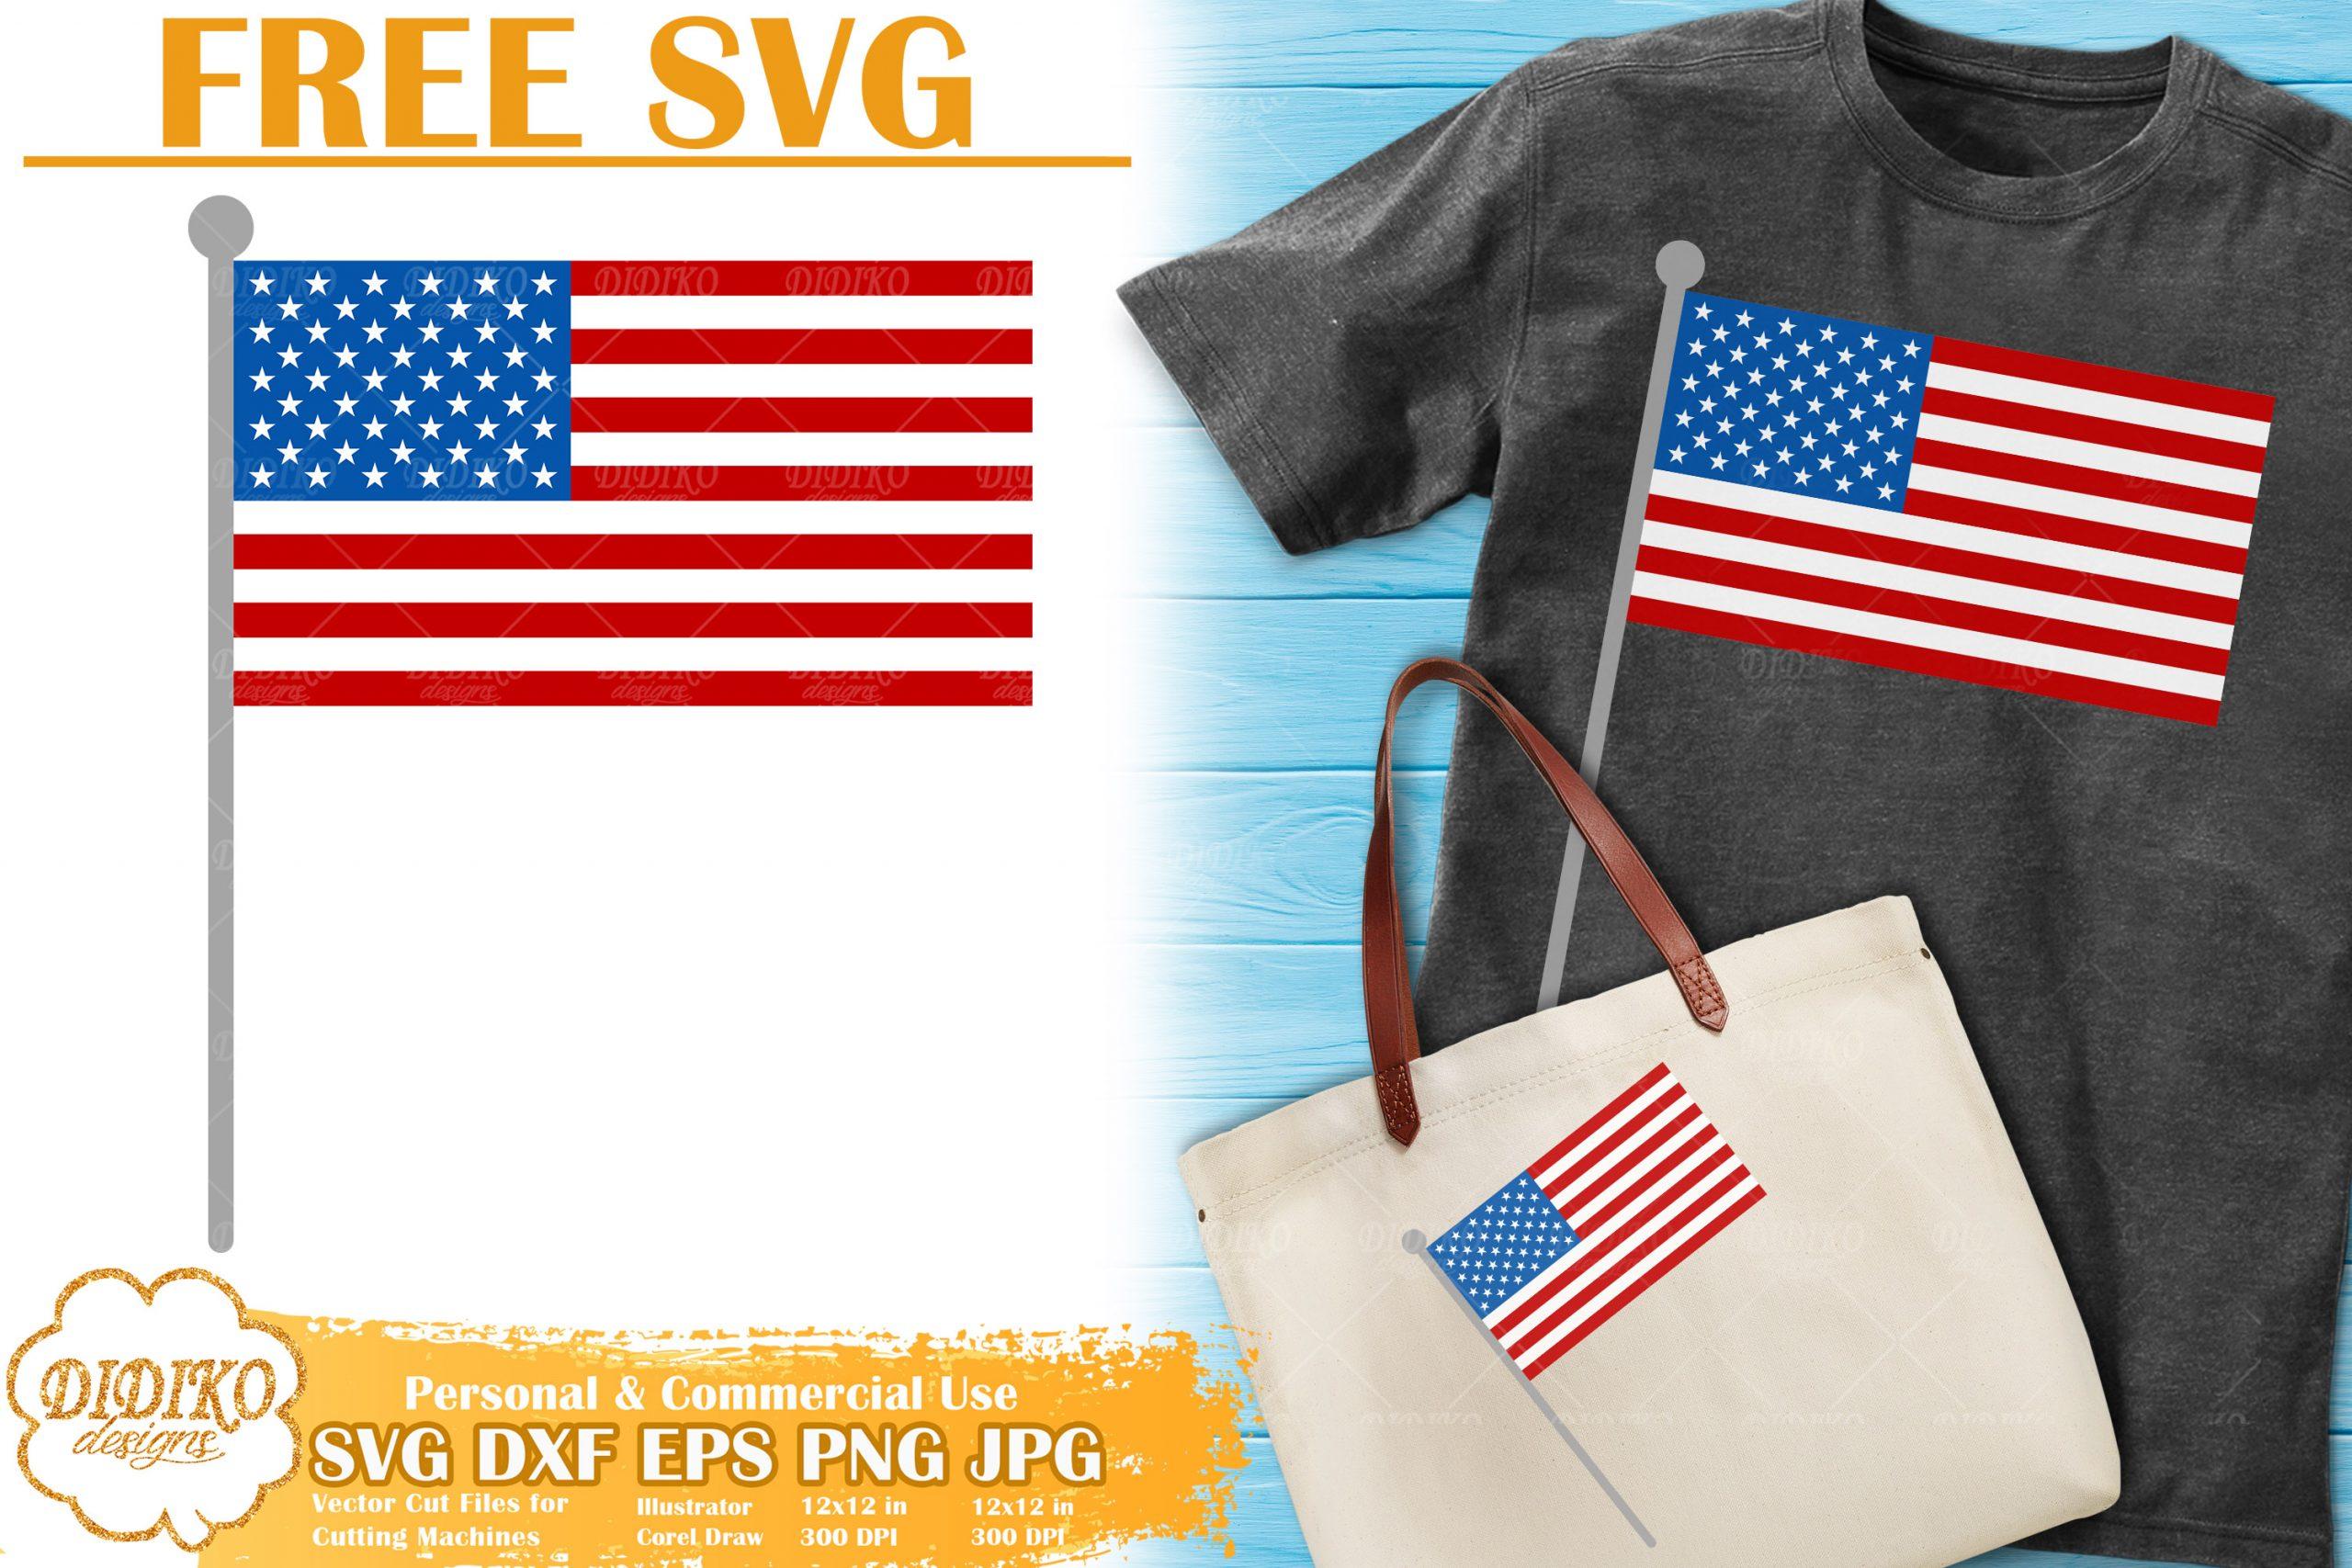 American Flag Free Svg 4th Of July Free Svg Cricut Didiko Designs